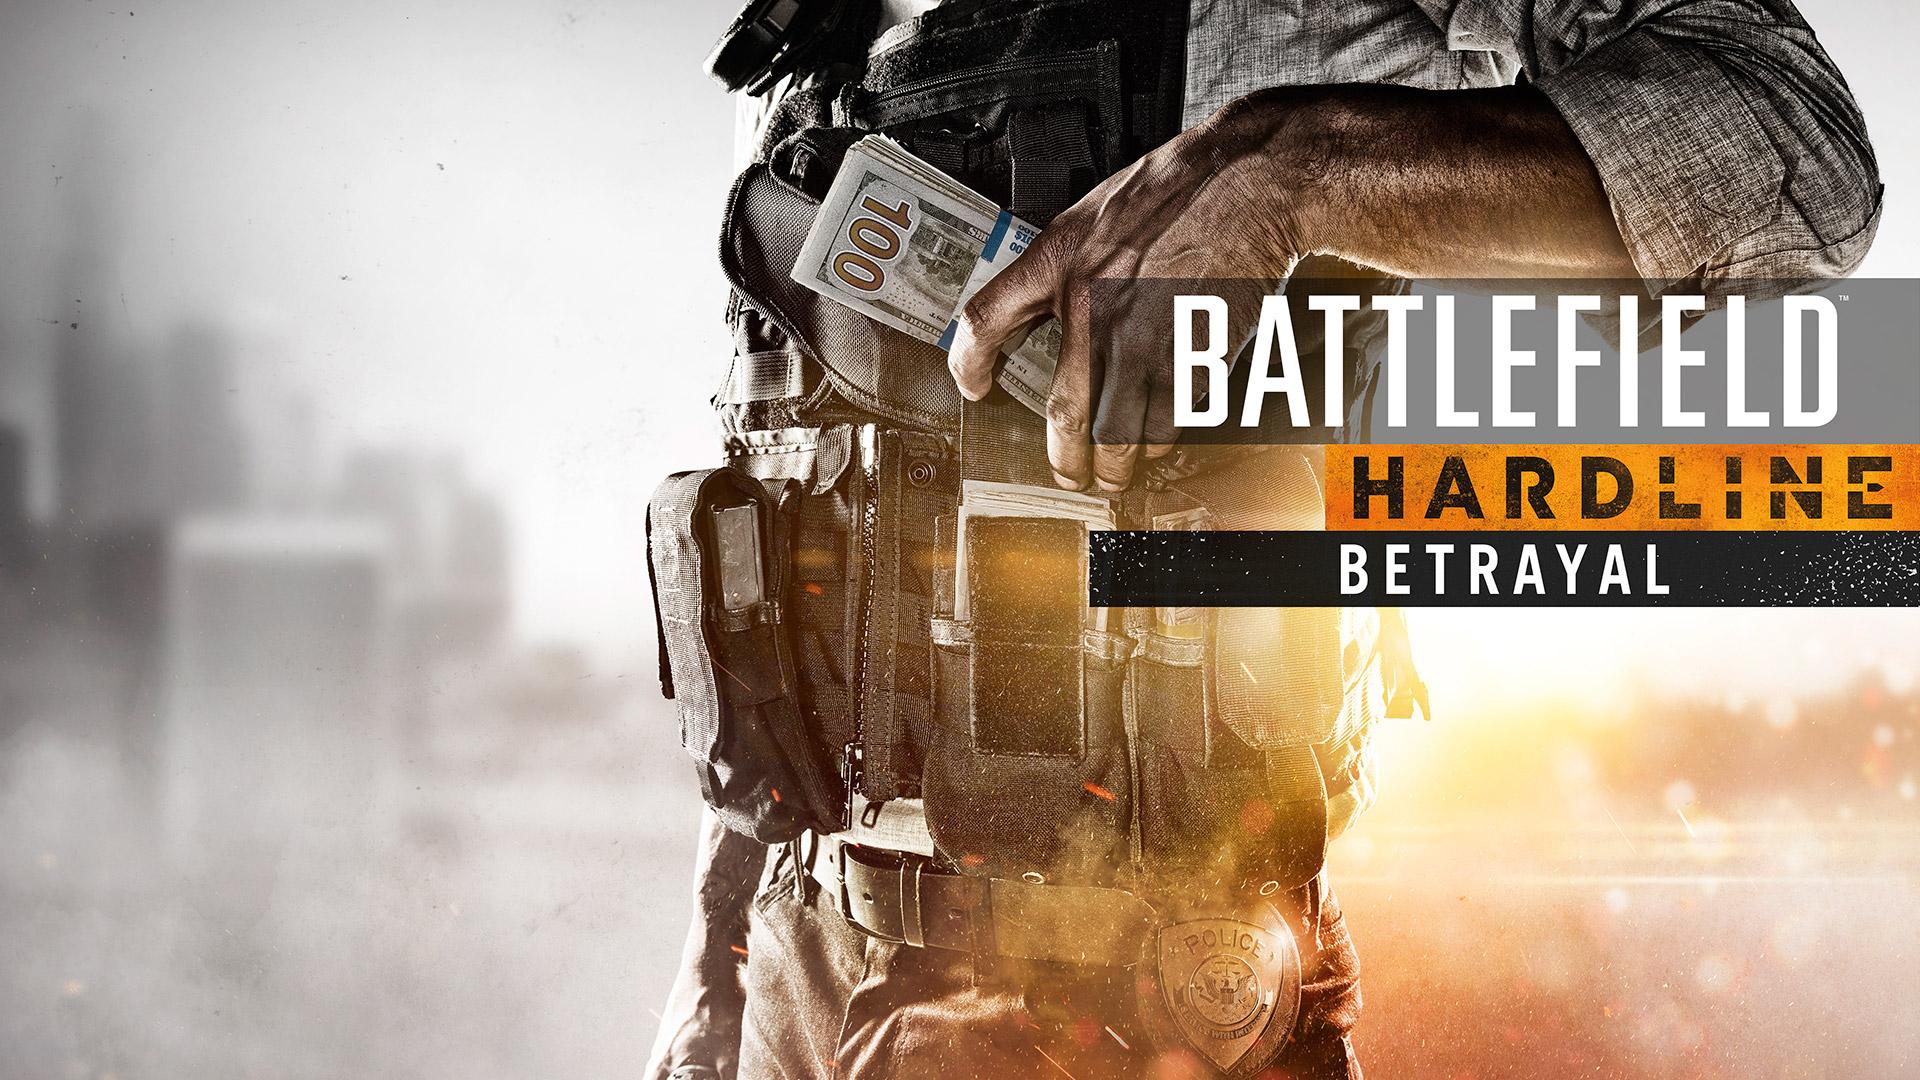 Battlefield Hardline Hd Wallpaper Battlefield Hardline Betrayal Dlc Additions Detailed Vg247